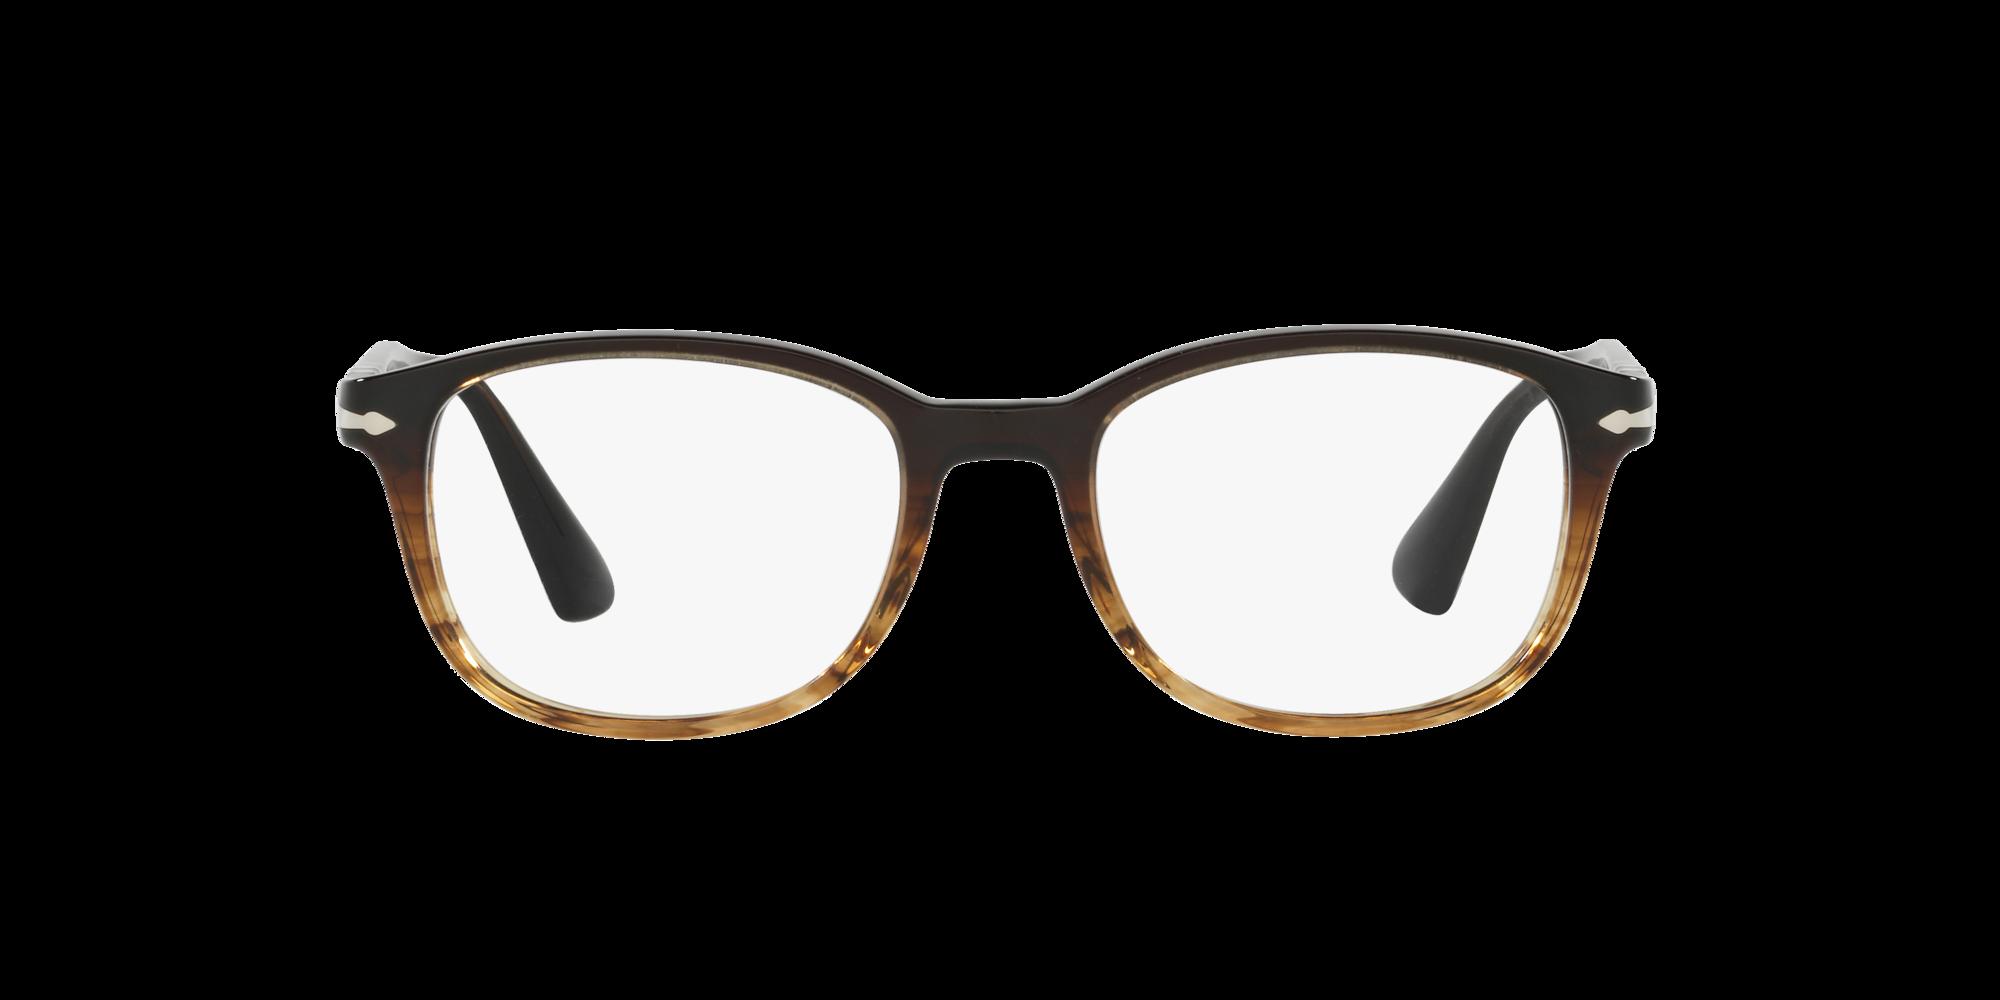 Image for PO3163V from LensCrafters | Glasses, Prescription Glasses Online, Eyewear